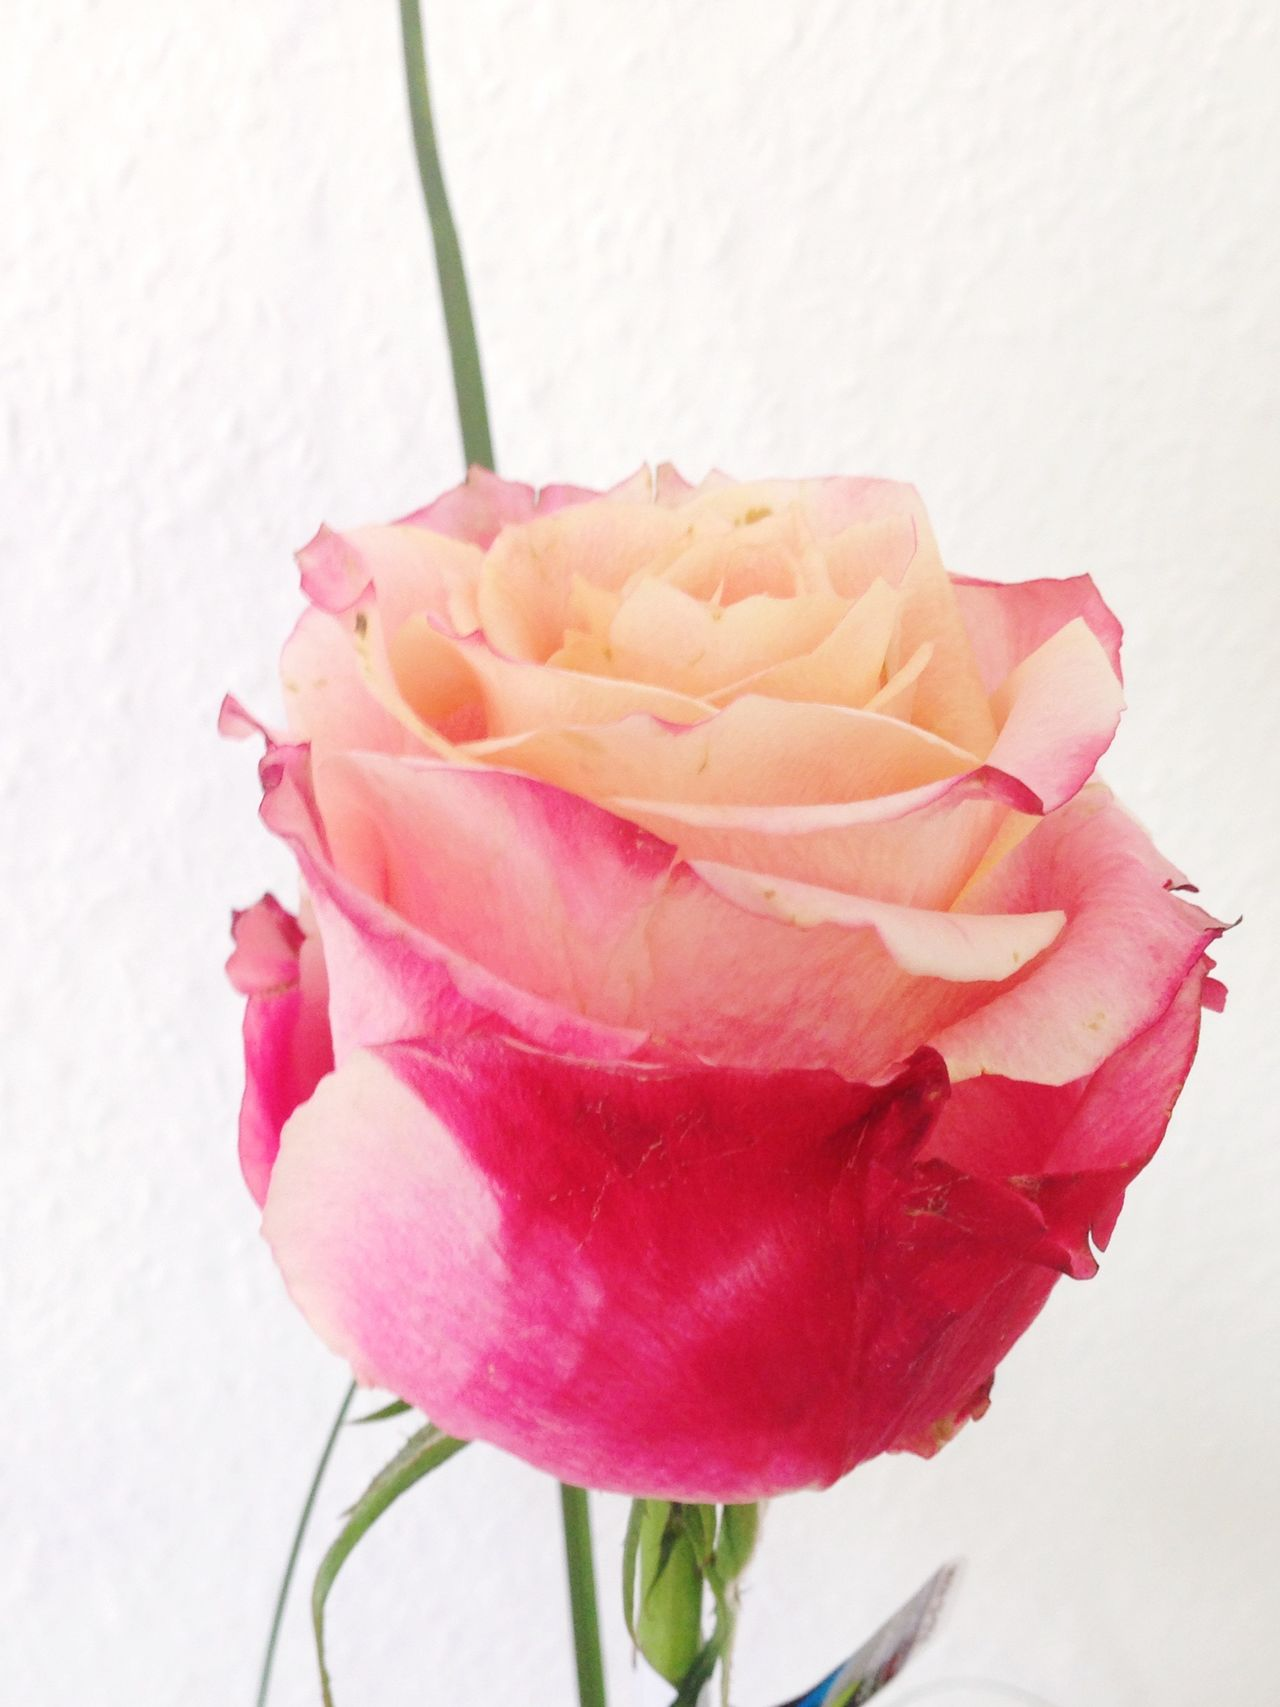 Roses Flowers  Rose🌹